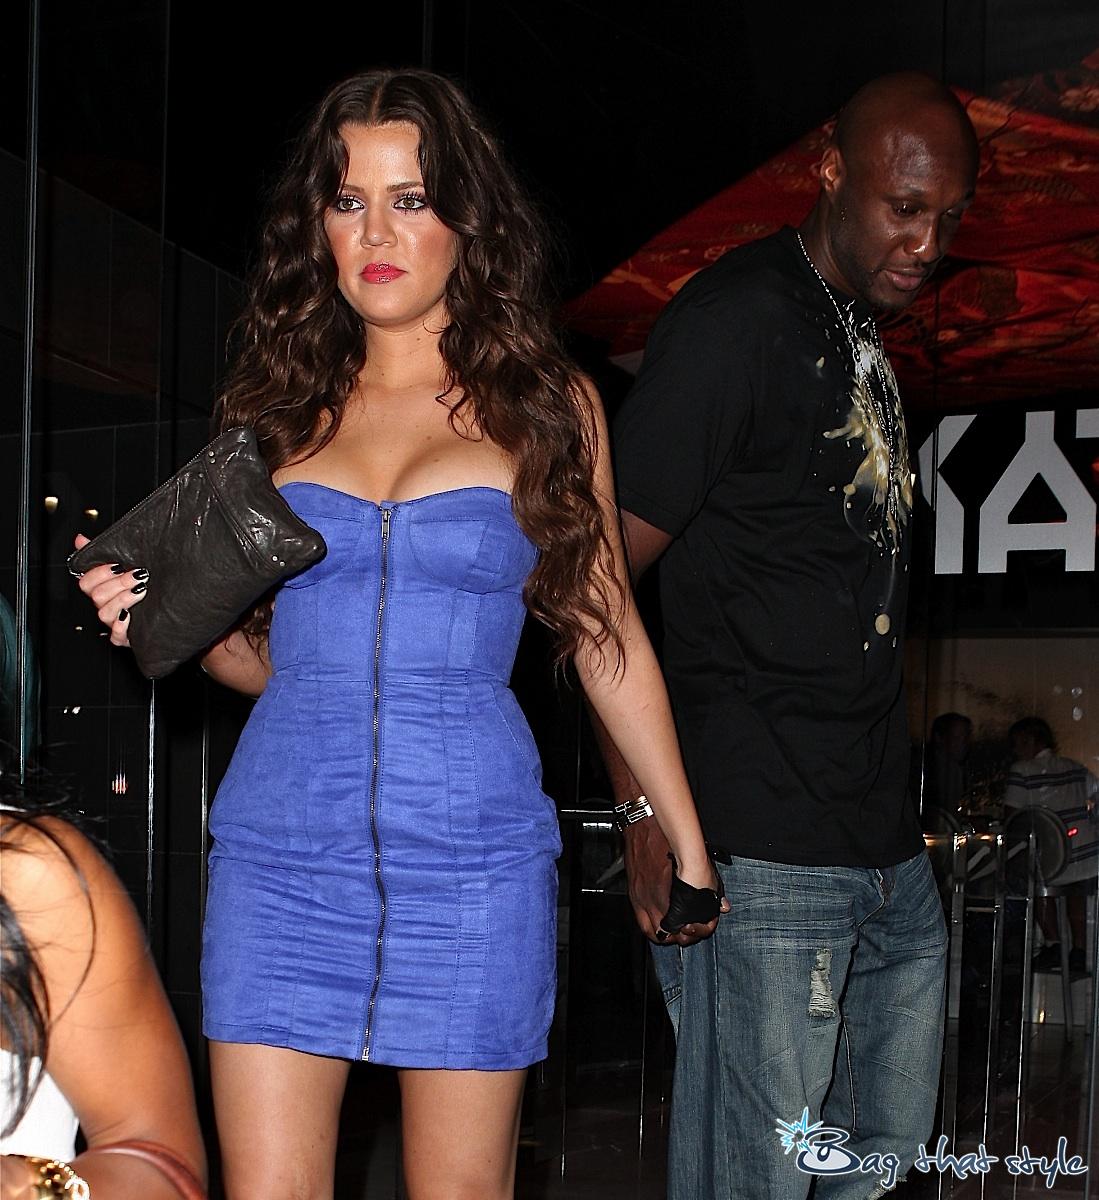 http://3.bp.blogspot.com/-JmGnHoHBcMw/TXOMleCUgII/AAAAAAAABVc/FN5ptB3MiE8/s1600/khloe-kardashian-carries-a-boring-black-clutch-003.jpg